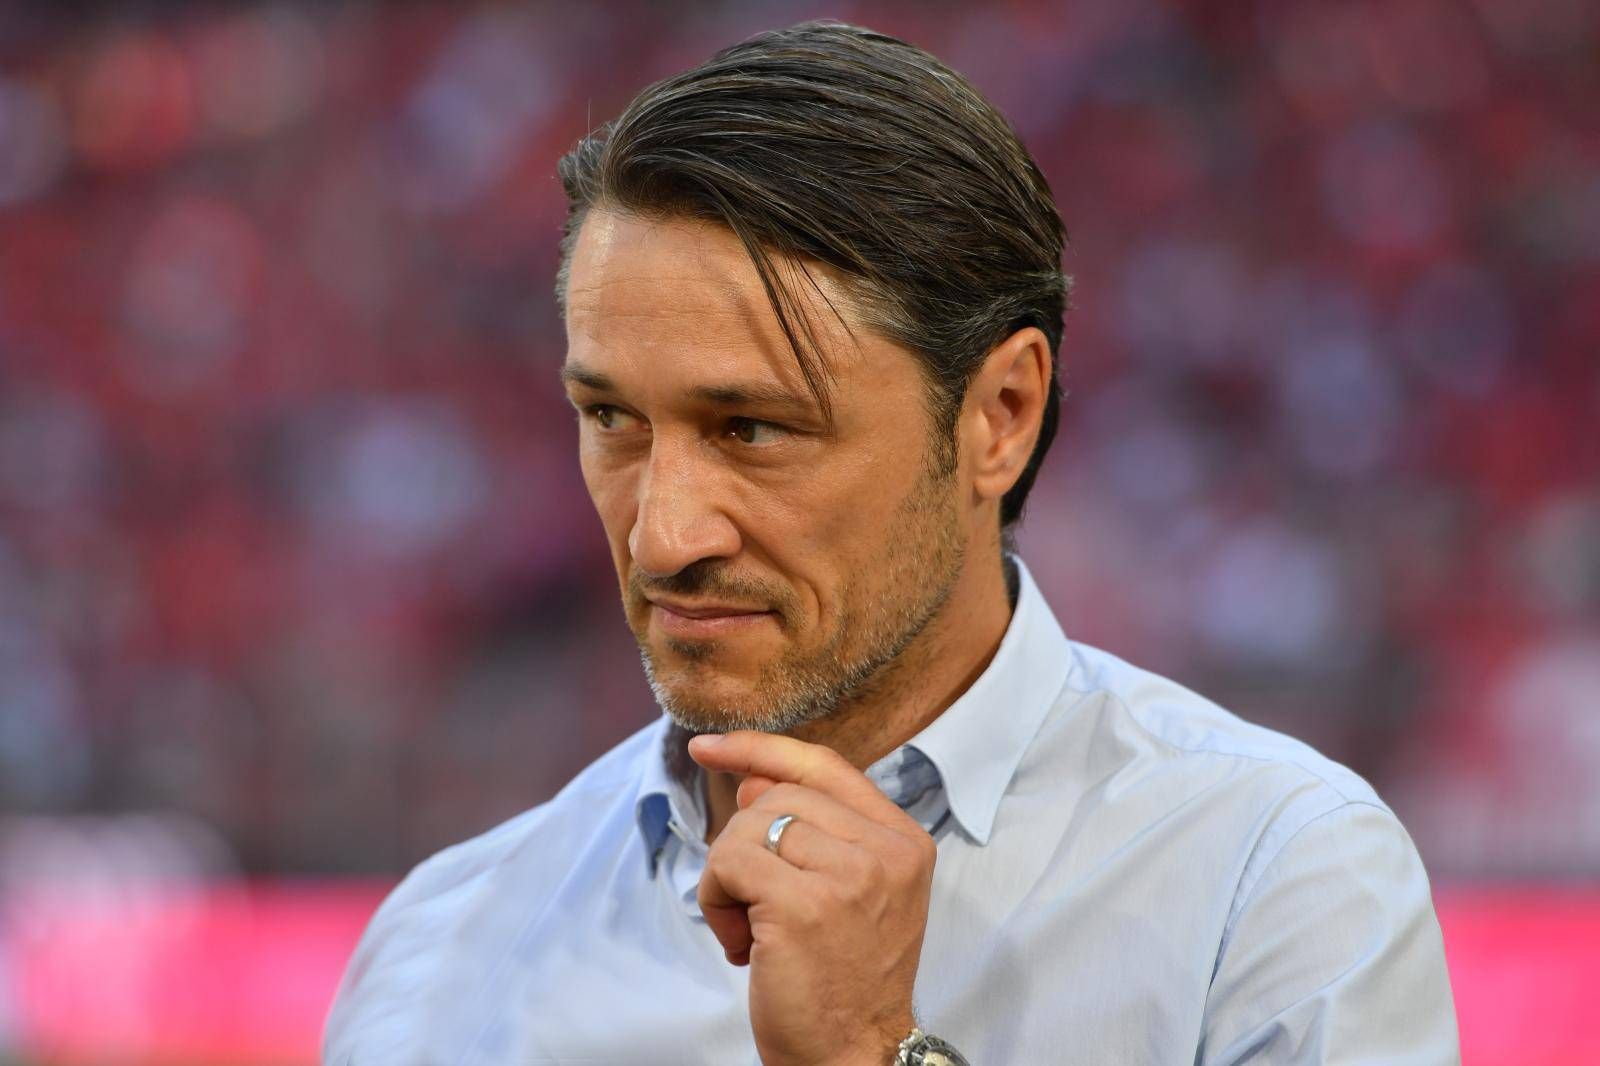 FC Bayern Munich separates by mutual agreement from Niko KOVAC.